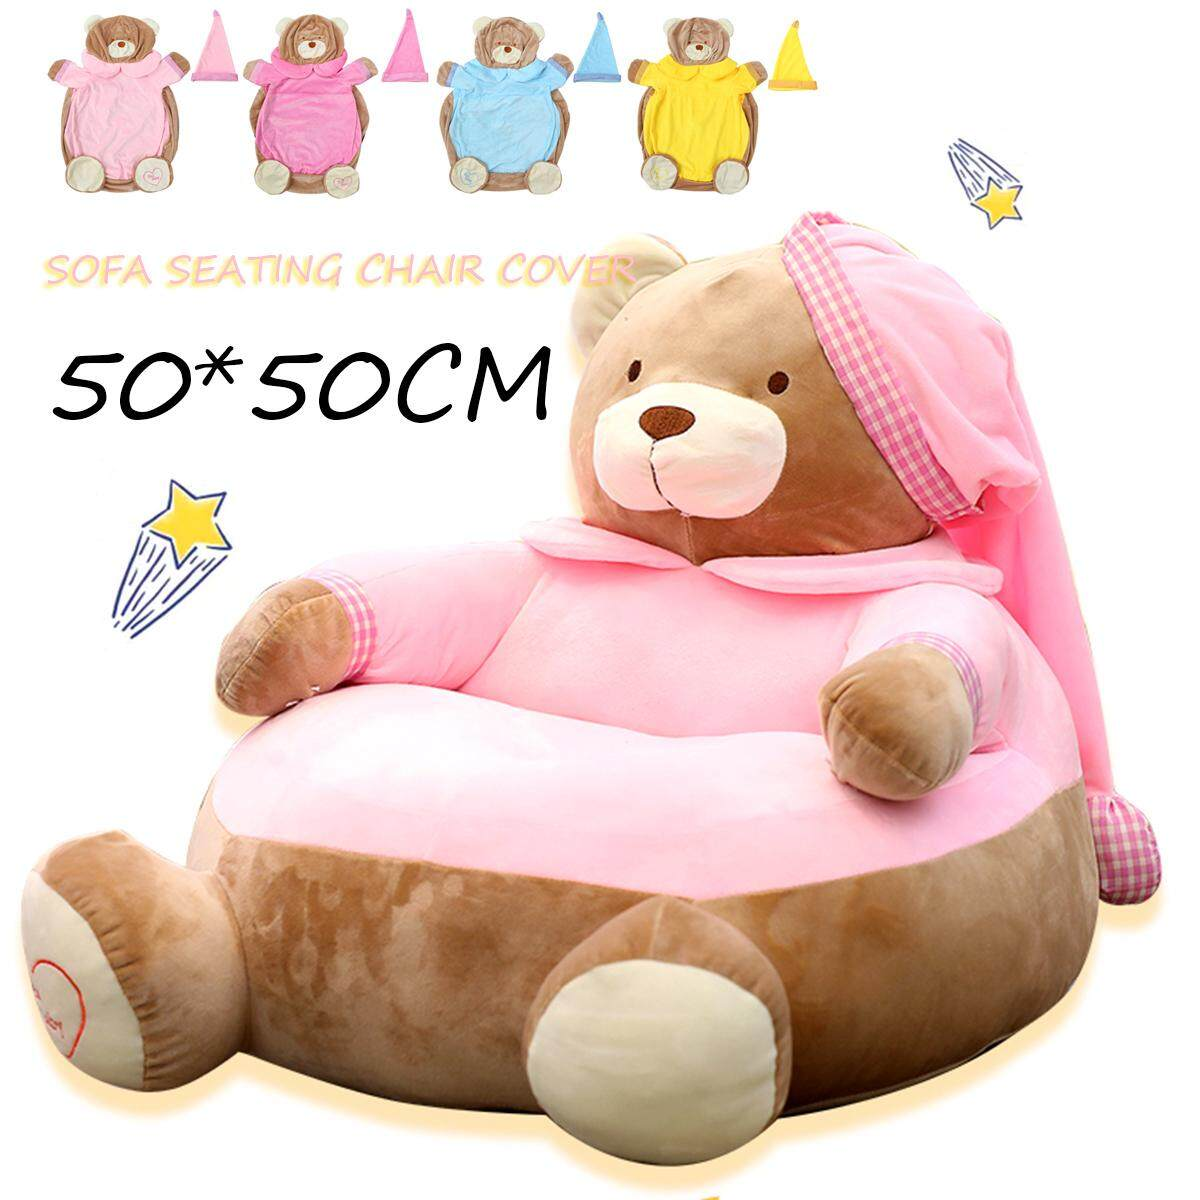 Anak-Anak Santai Tempat Duduk Sofa Sarung Kursi Hanya Malas Bean Bag Mebel Bayi By Glimmer.